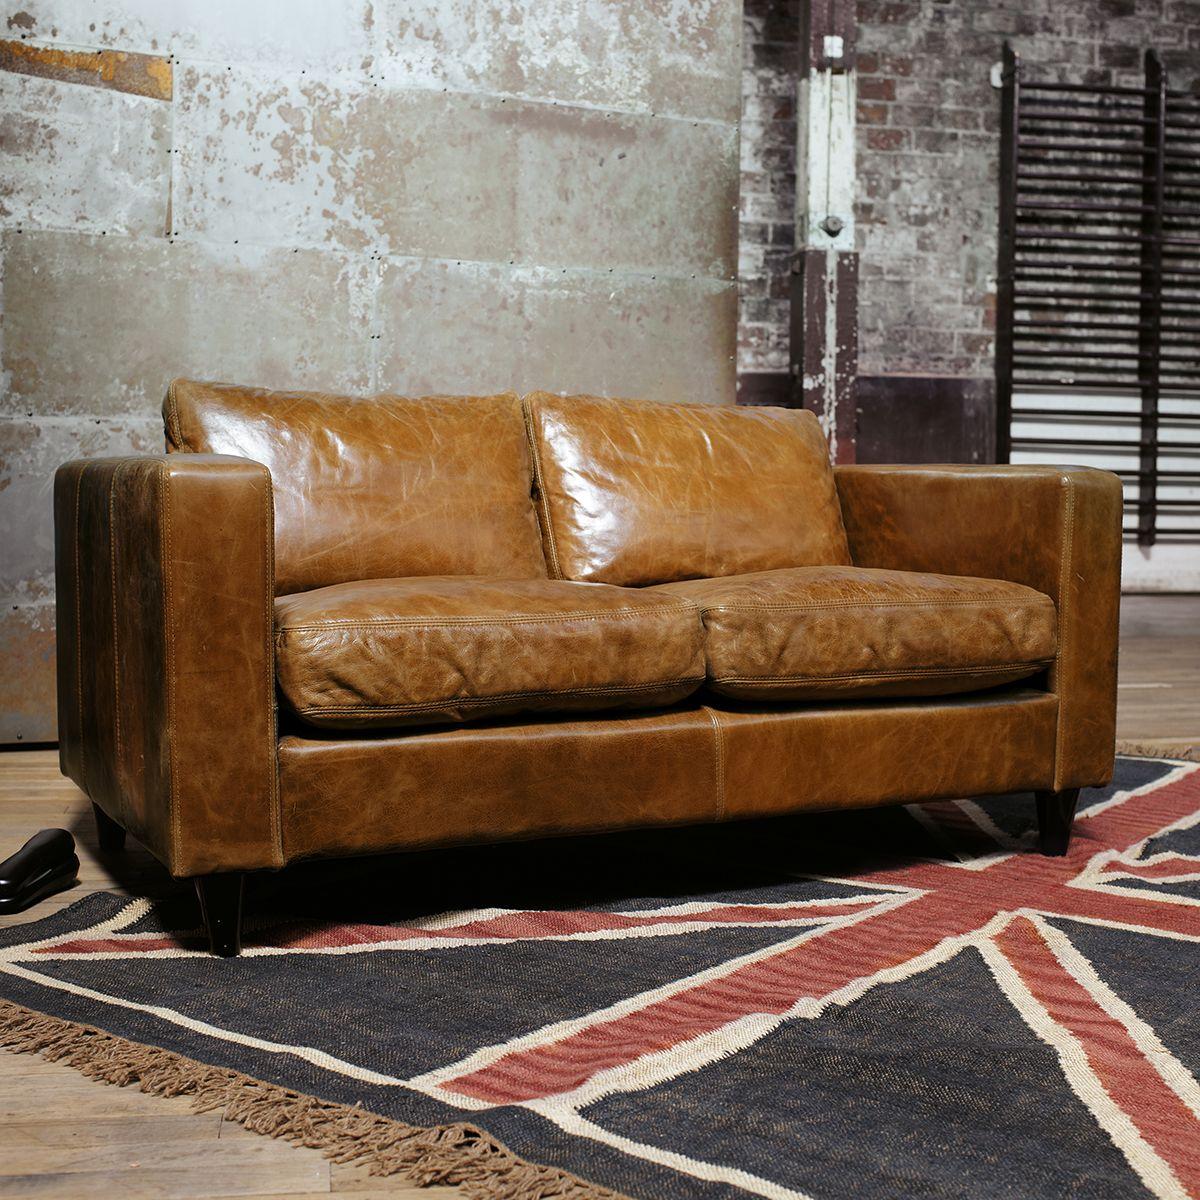 camel leren vintage 3 plaatsen zitbank cuir vintage canap s et fixe. Black Bedroom Furniture Sets. Home Design Ideas